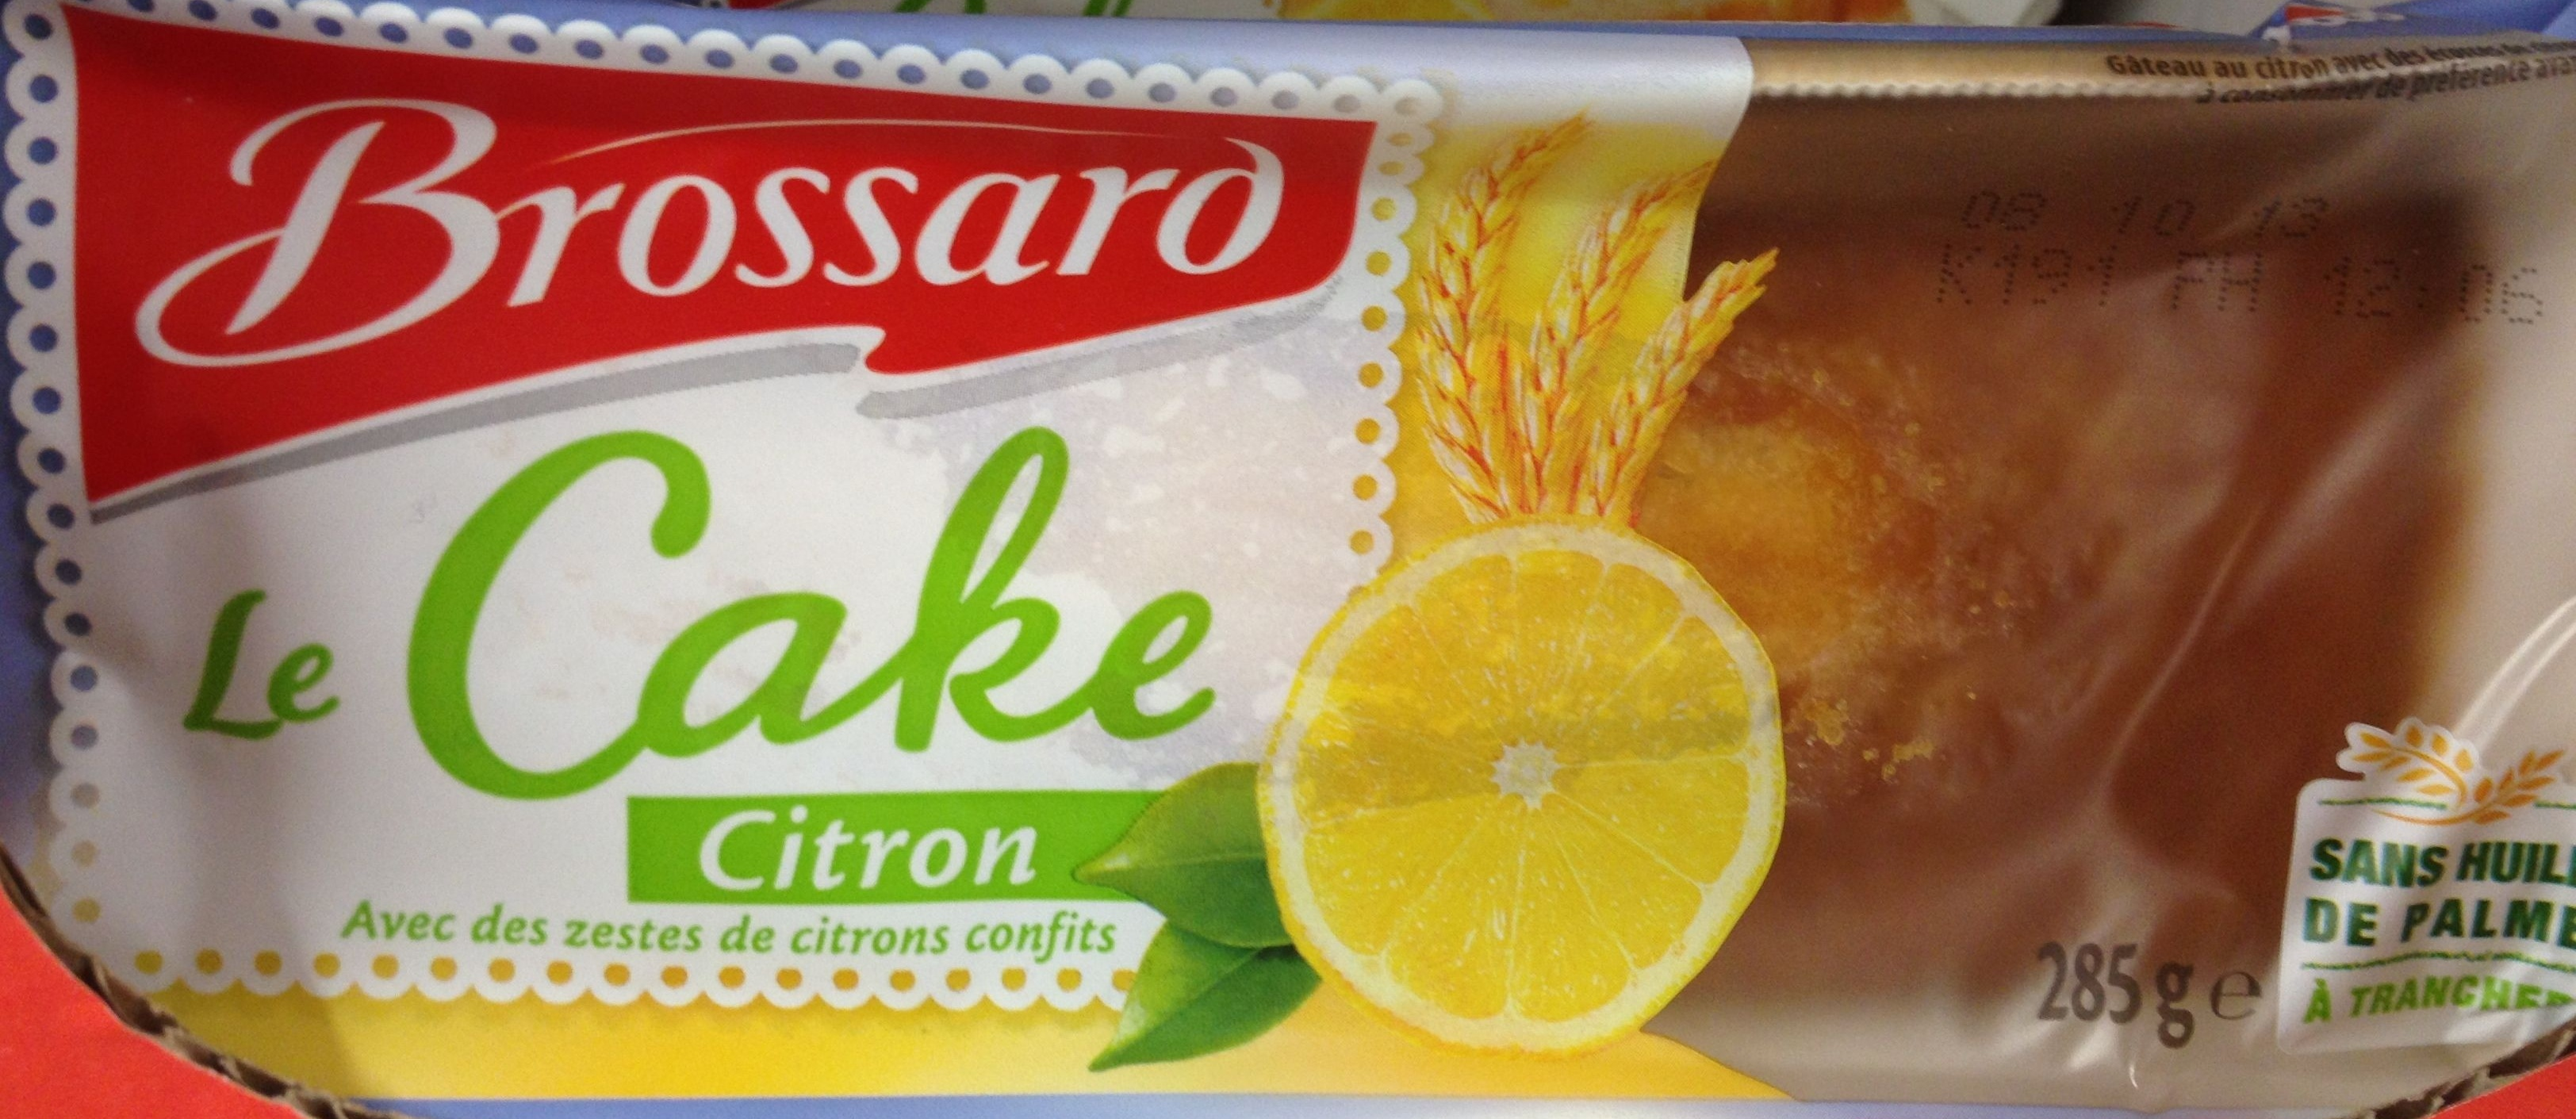 Le cake citron - Product